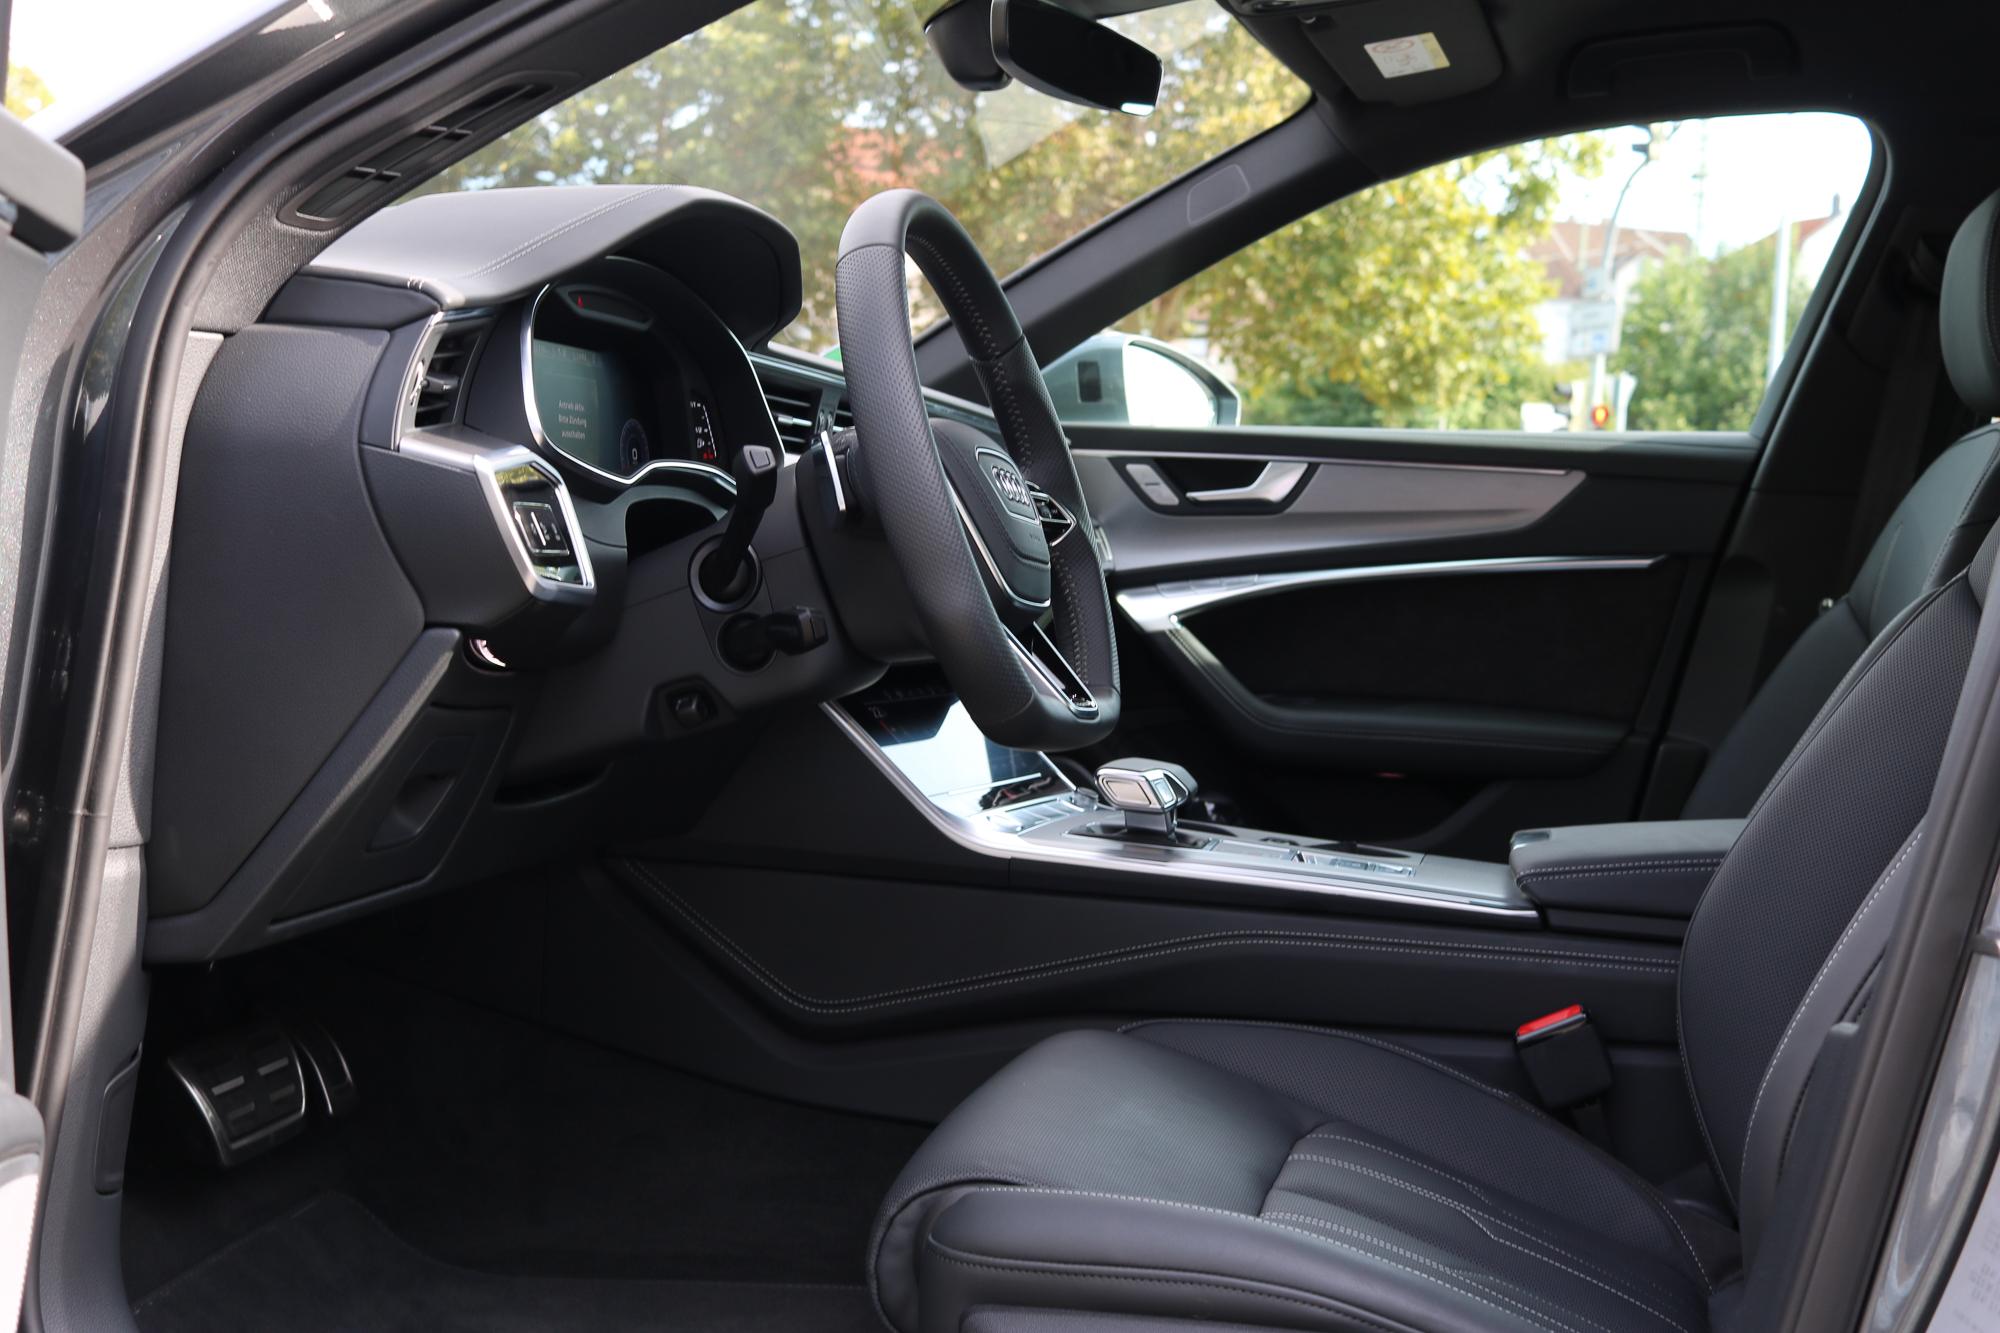 2019 Audi A6 Avant 50 Tdi Quattro Fahrbericht Test Review Rad